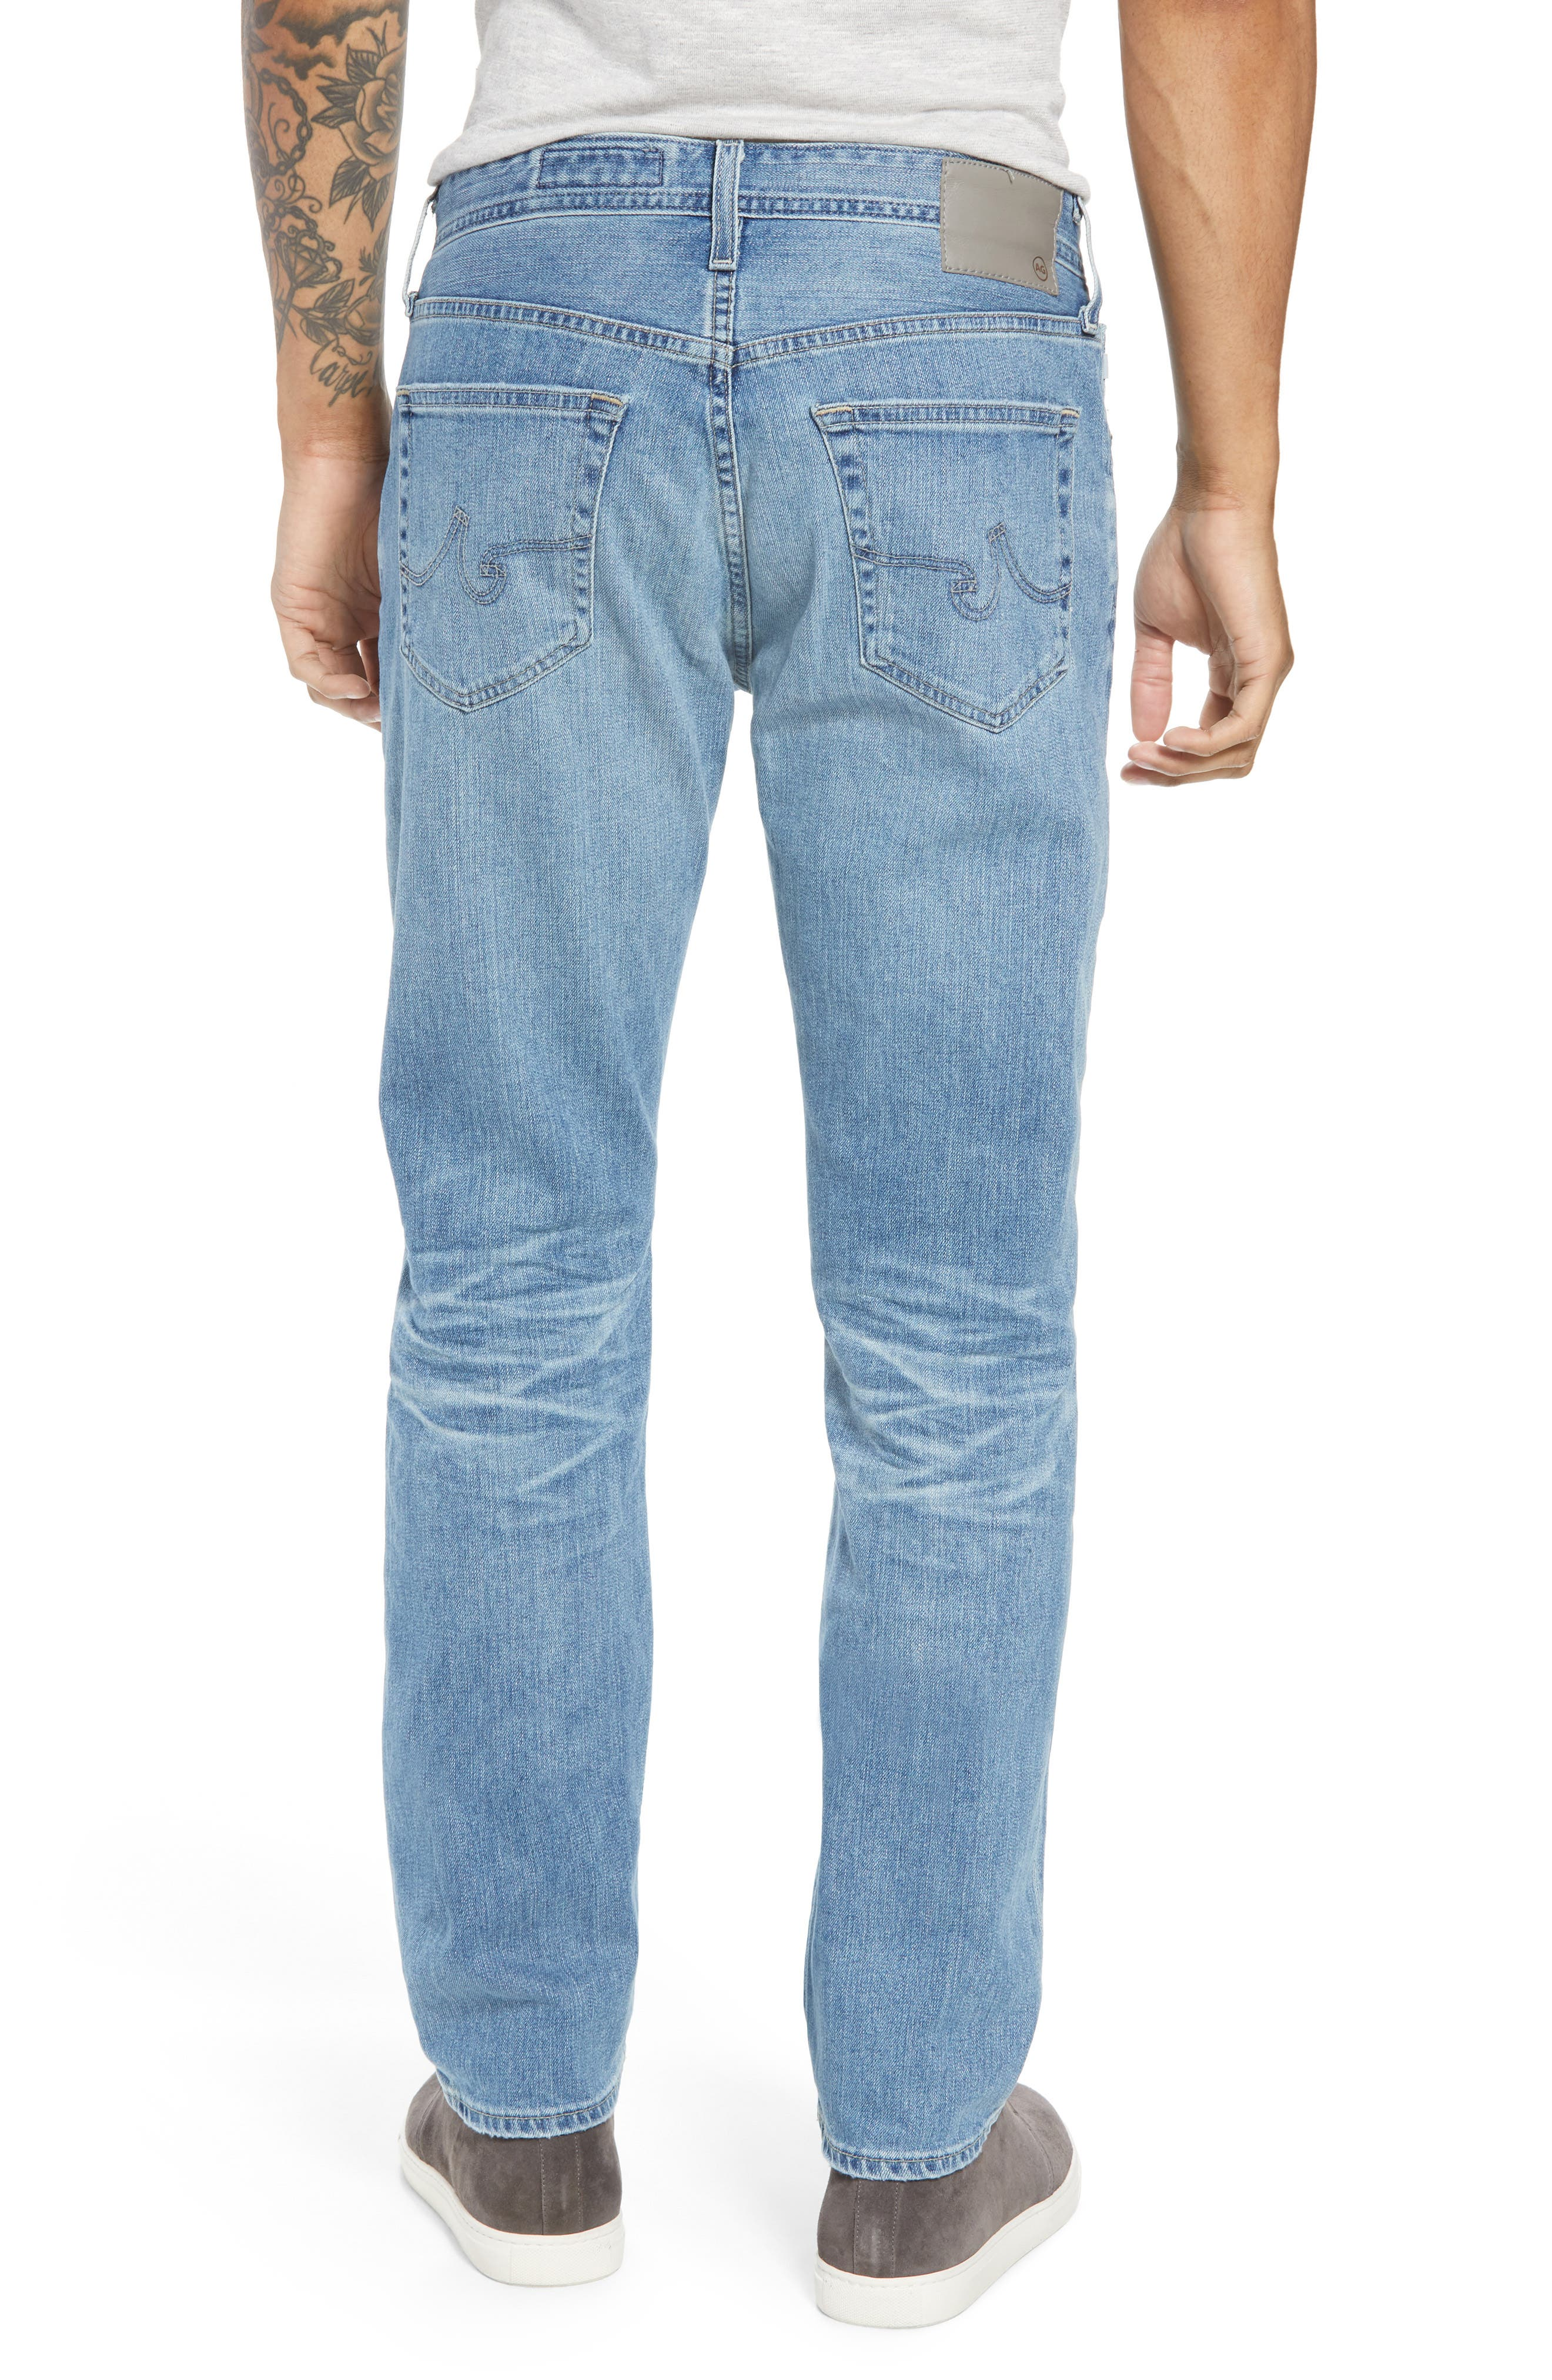 Everett Slim Straight Fit Jeans,                             Alternate thumbnail 2, color,                             18 Years Oceano